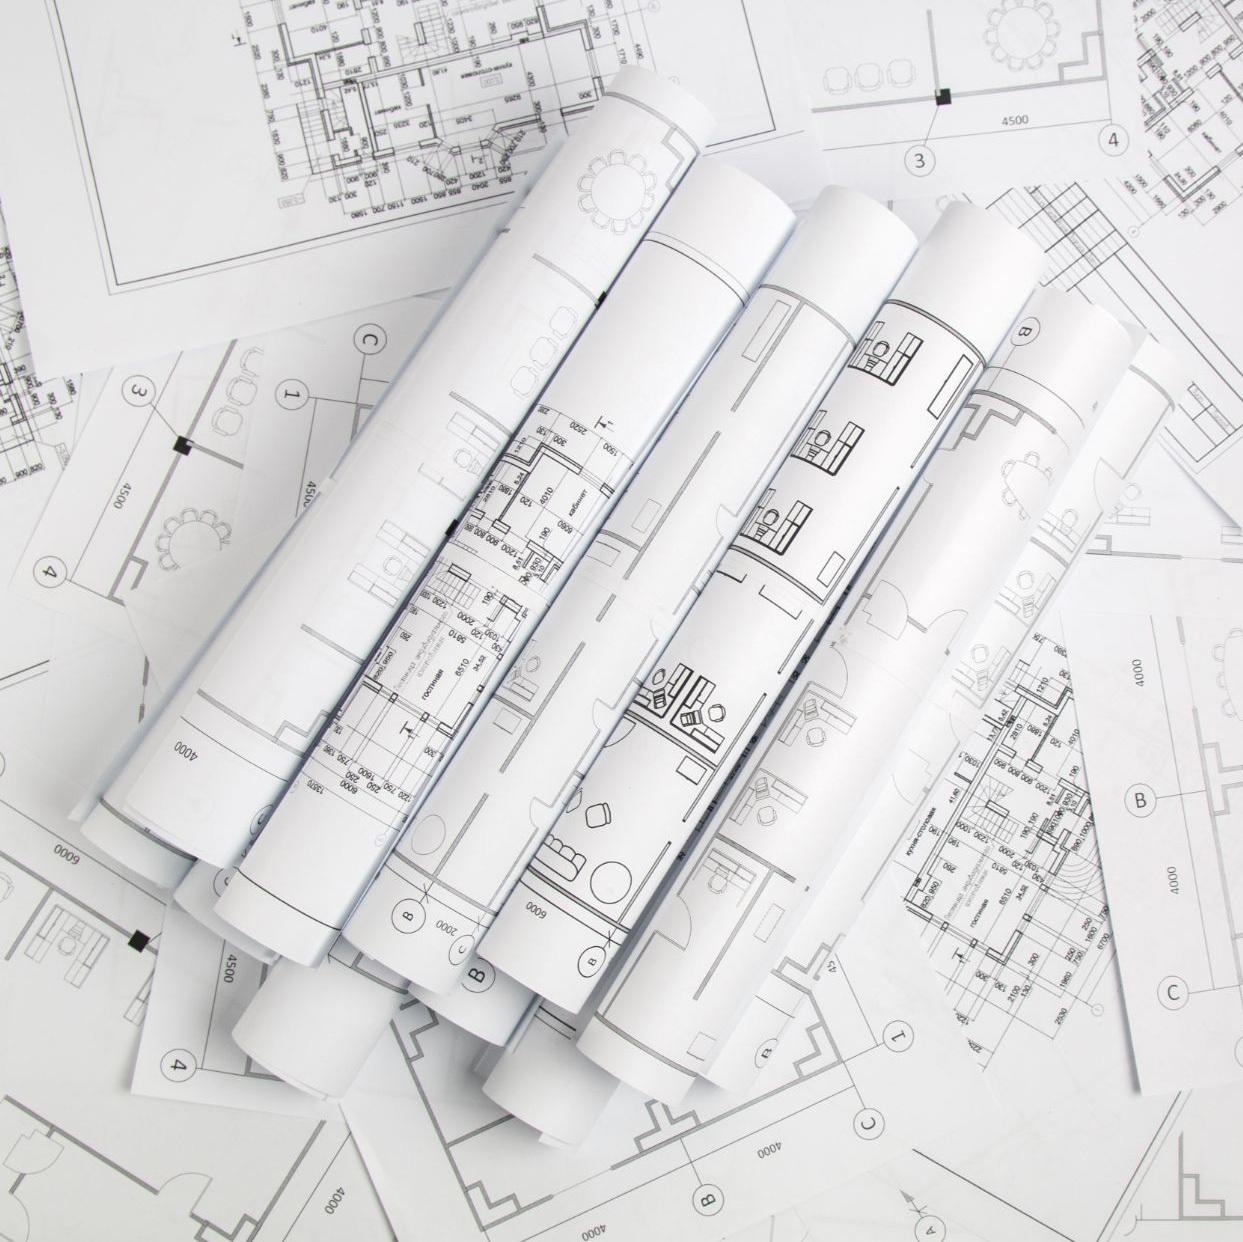 Apartment plans (demo)